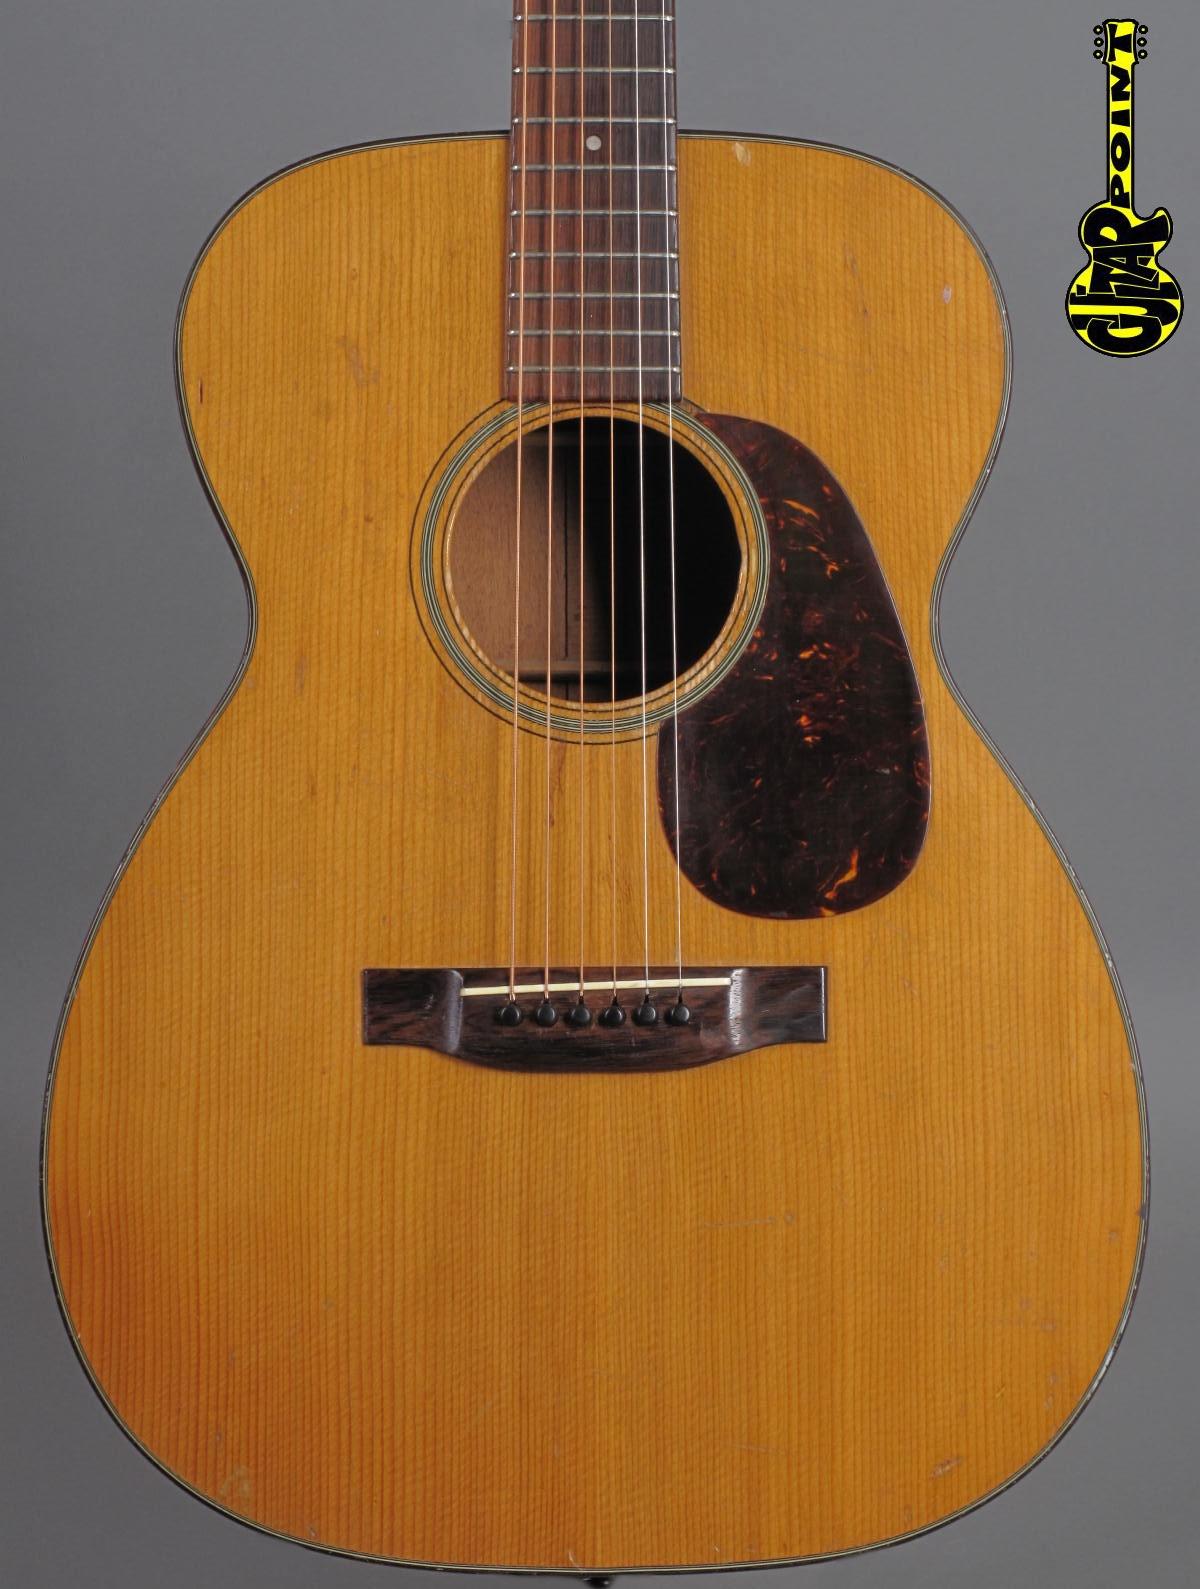 1955 Martin 00-18 - Natural